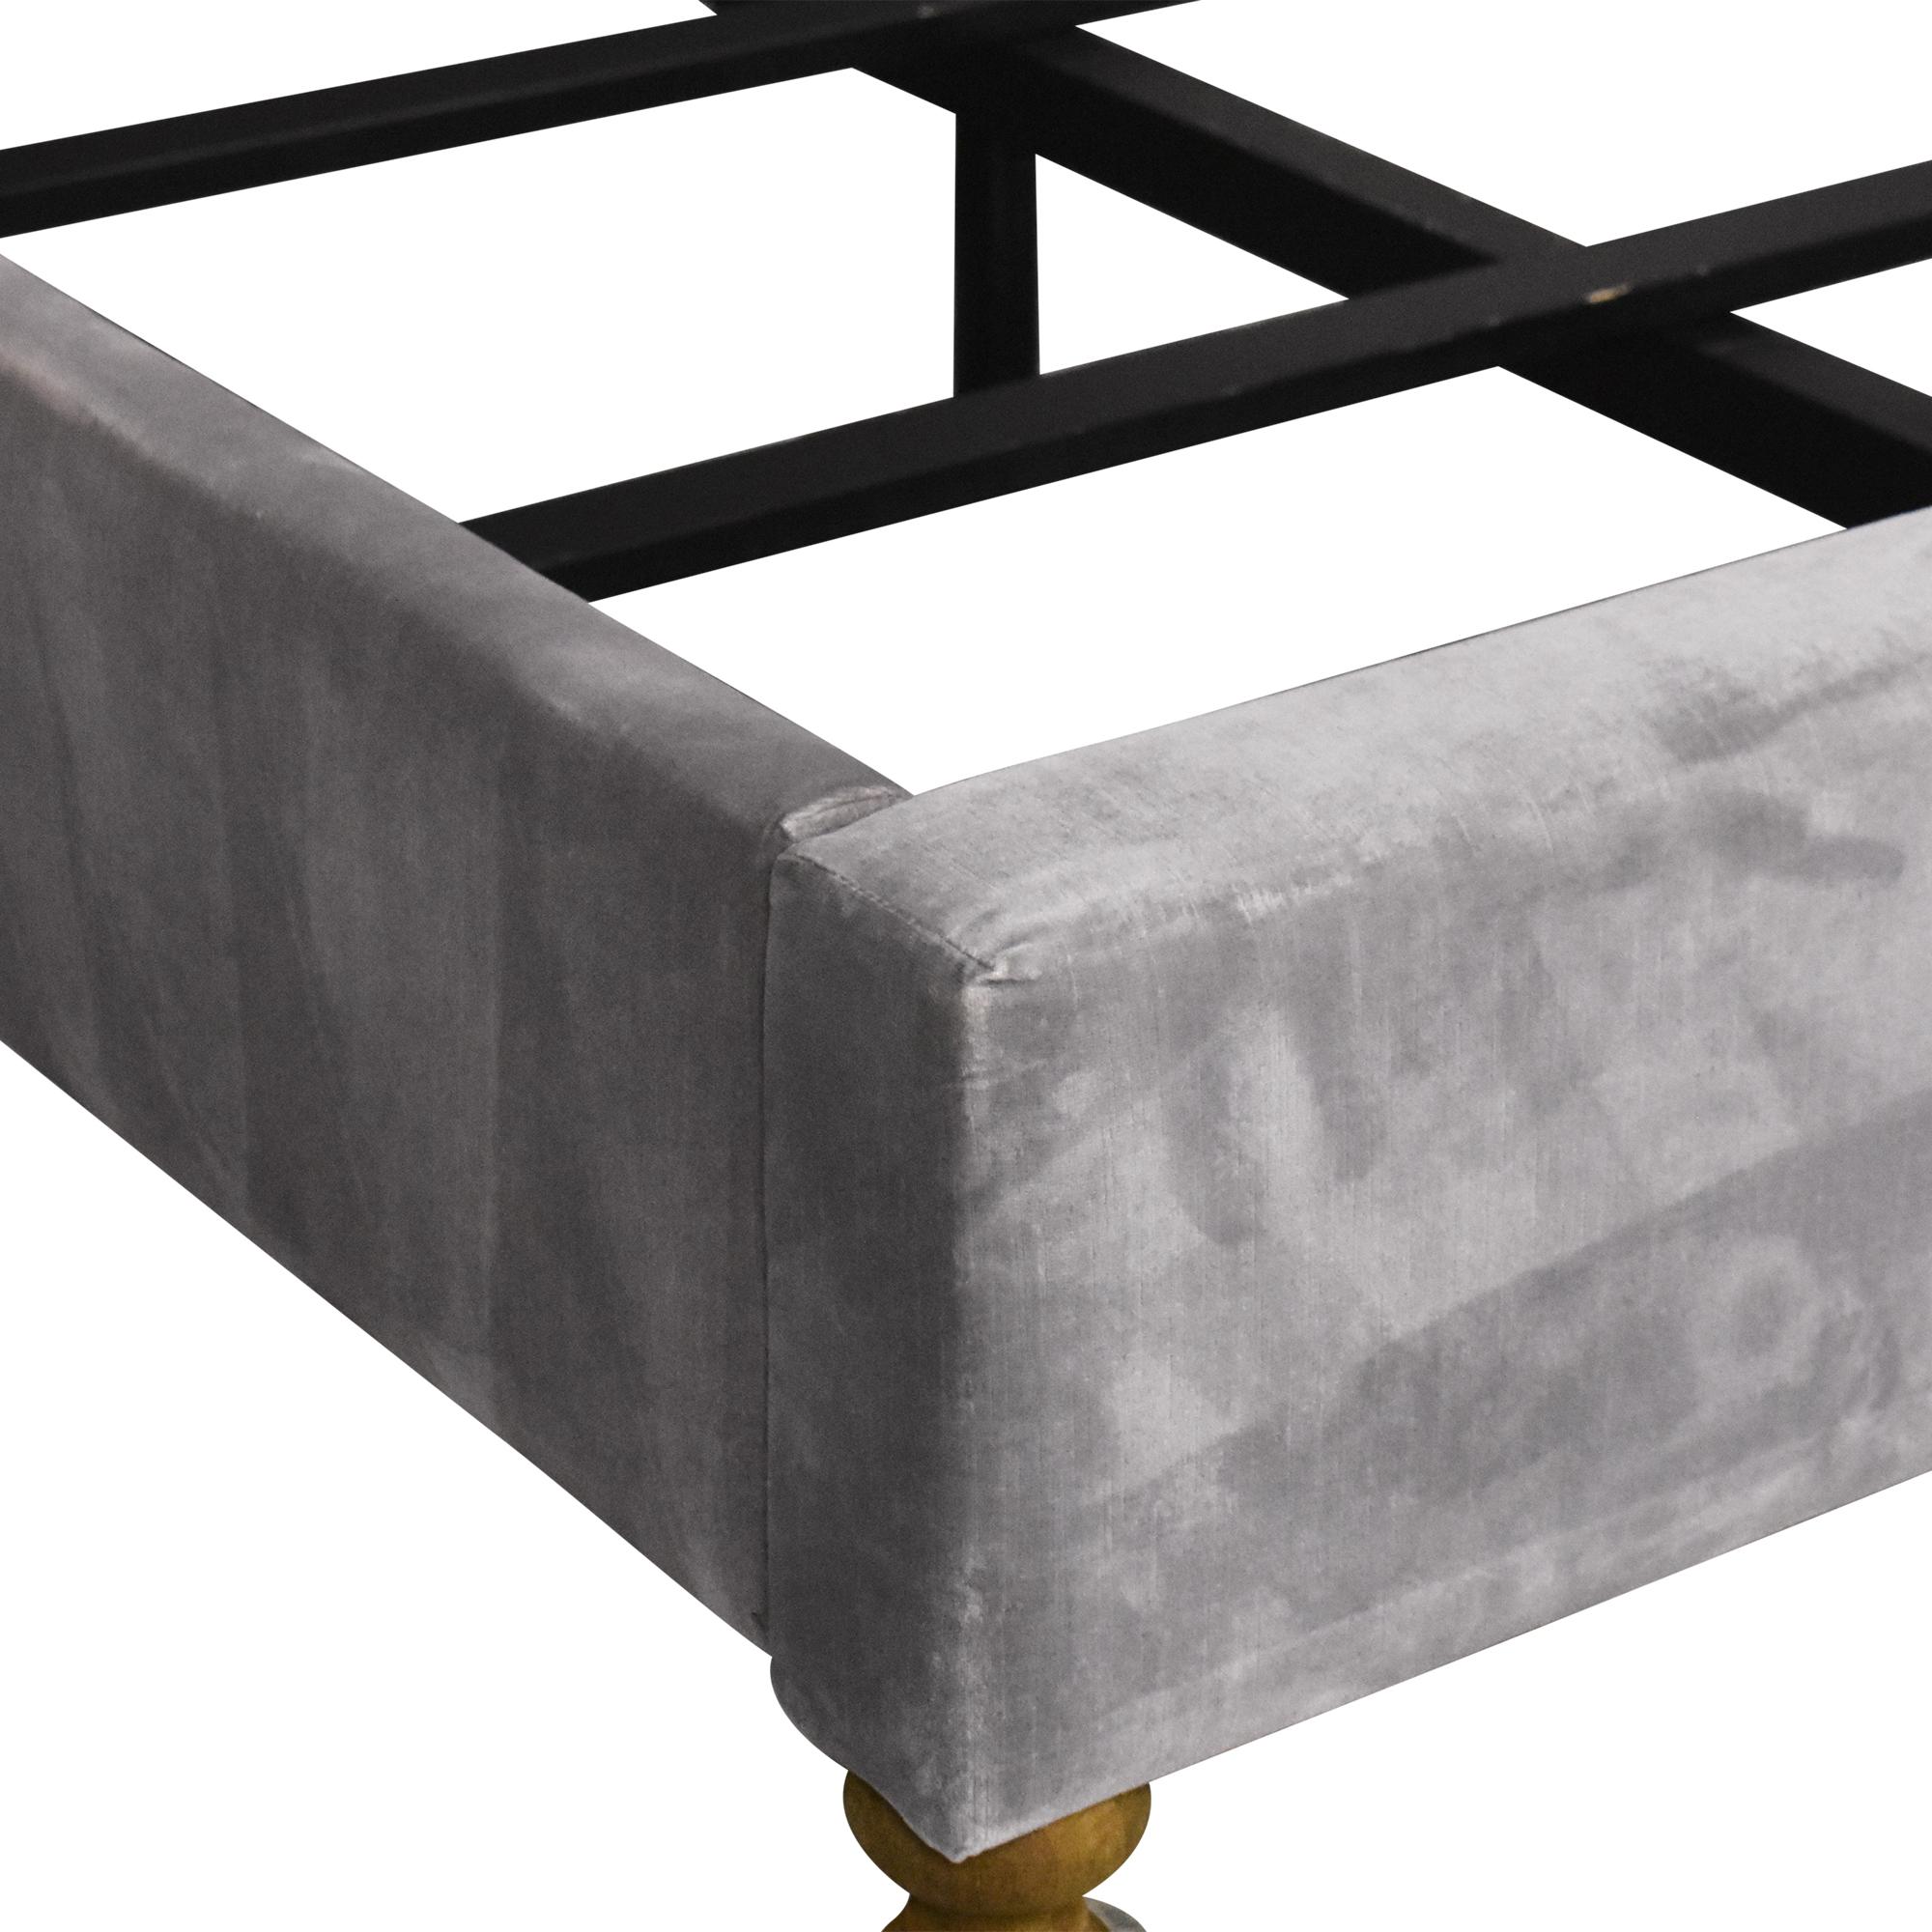 Restoration Hardware Chesterfield Panel Full Bed / Bed Frames